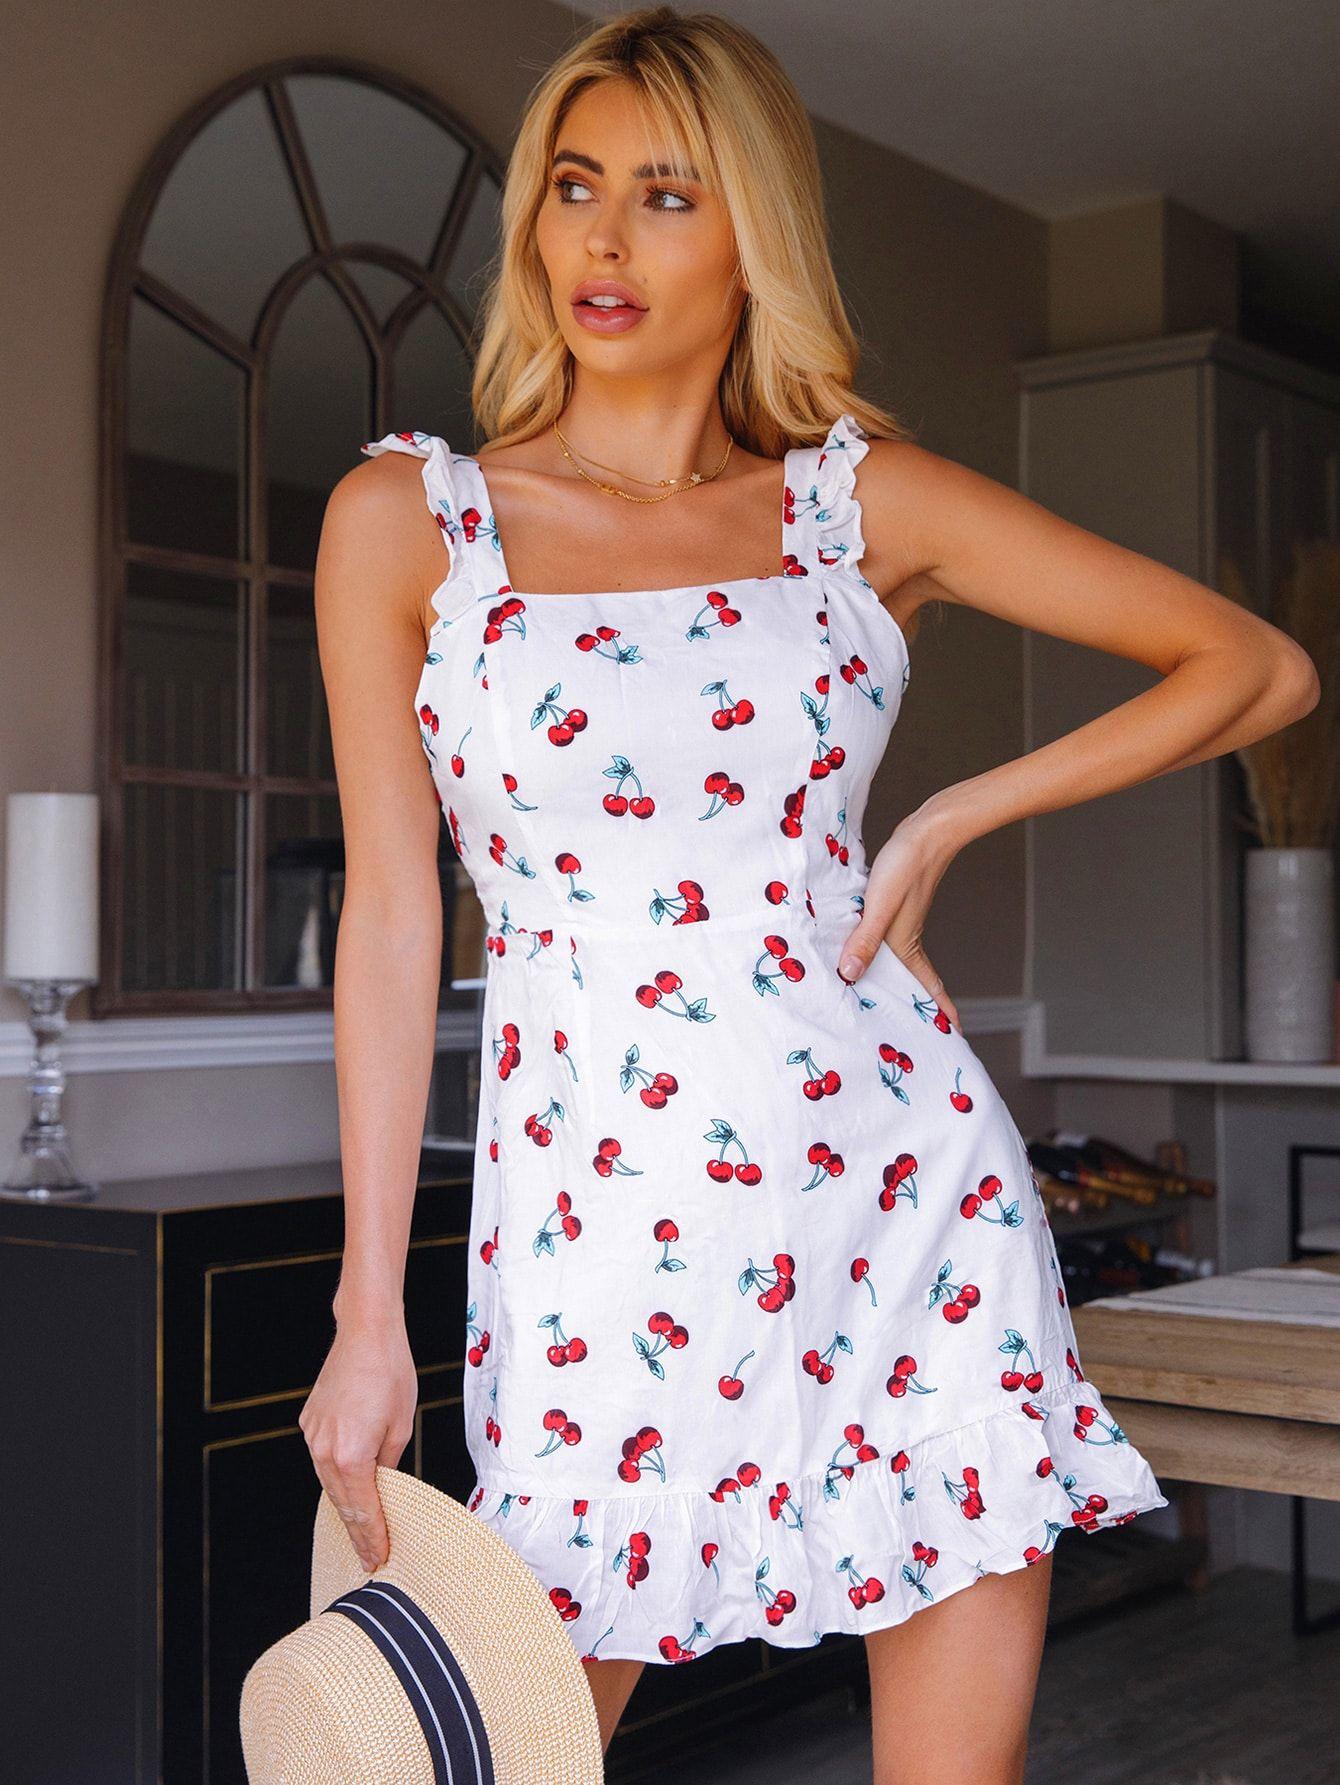 Ruffle Detail Cherry Print Dress Shein Usa Cherry Print Dress Womens Trendy Dresses Print Dress [ 1785 x 1340 Pixel ]